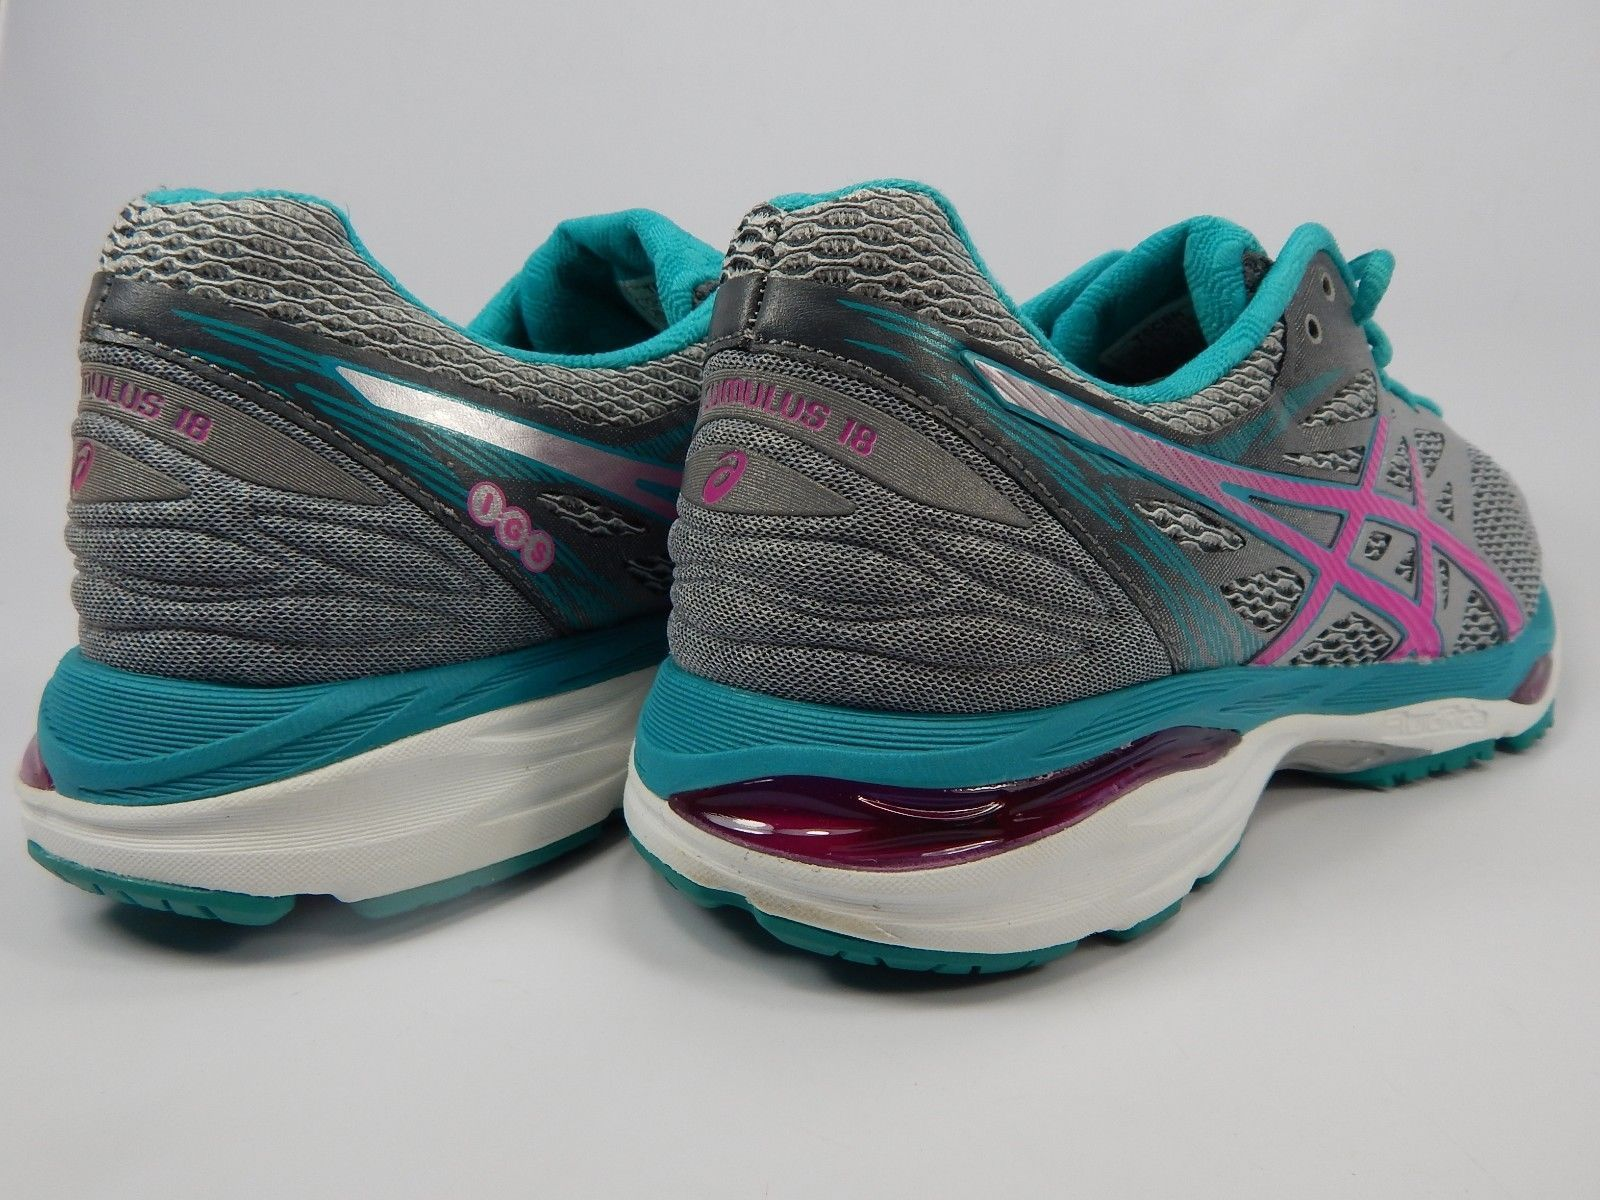 Asics Gel Cumulus 18 Size US 10 M (B) EU 42 Women's Running Shoes Silver T6C8N